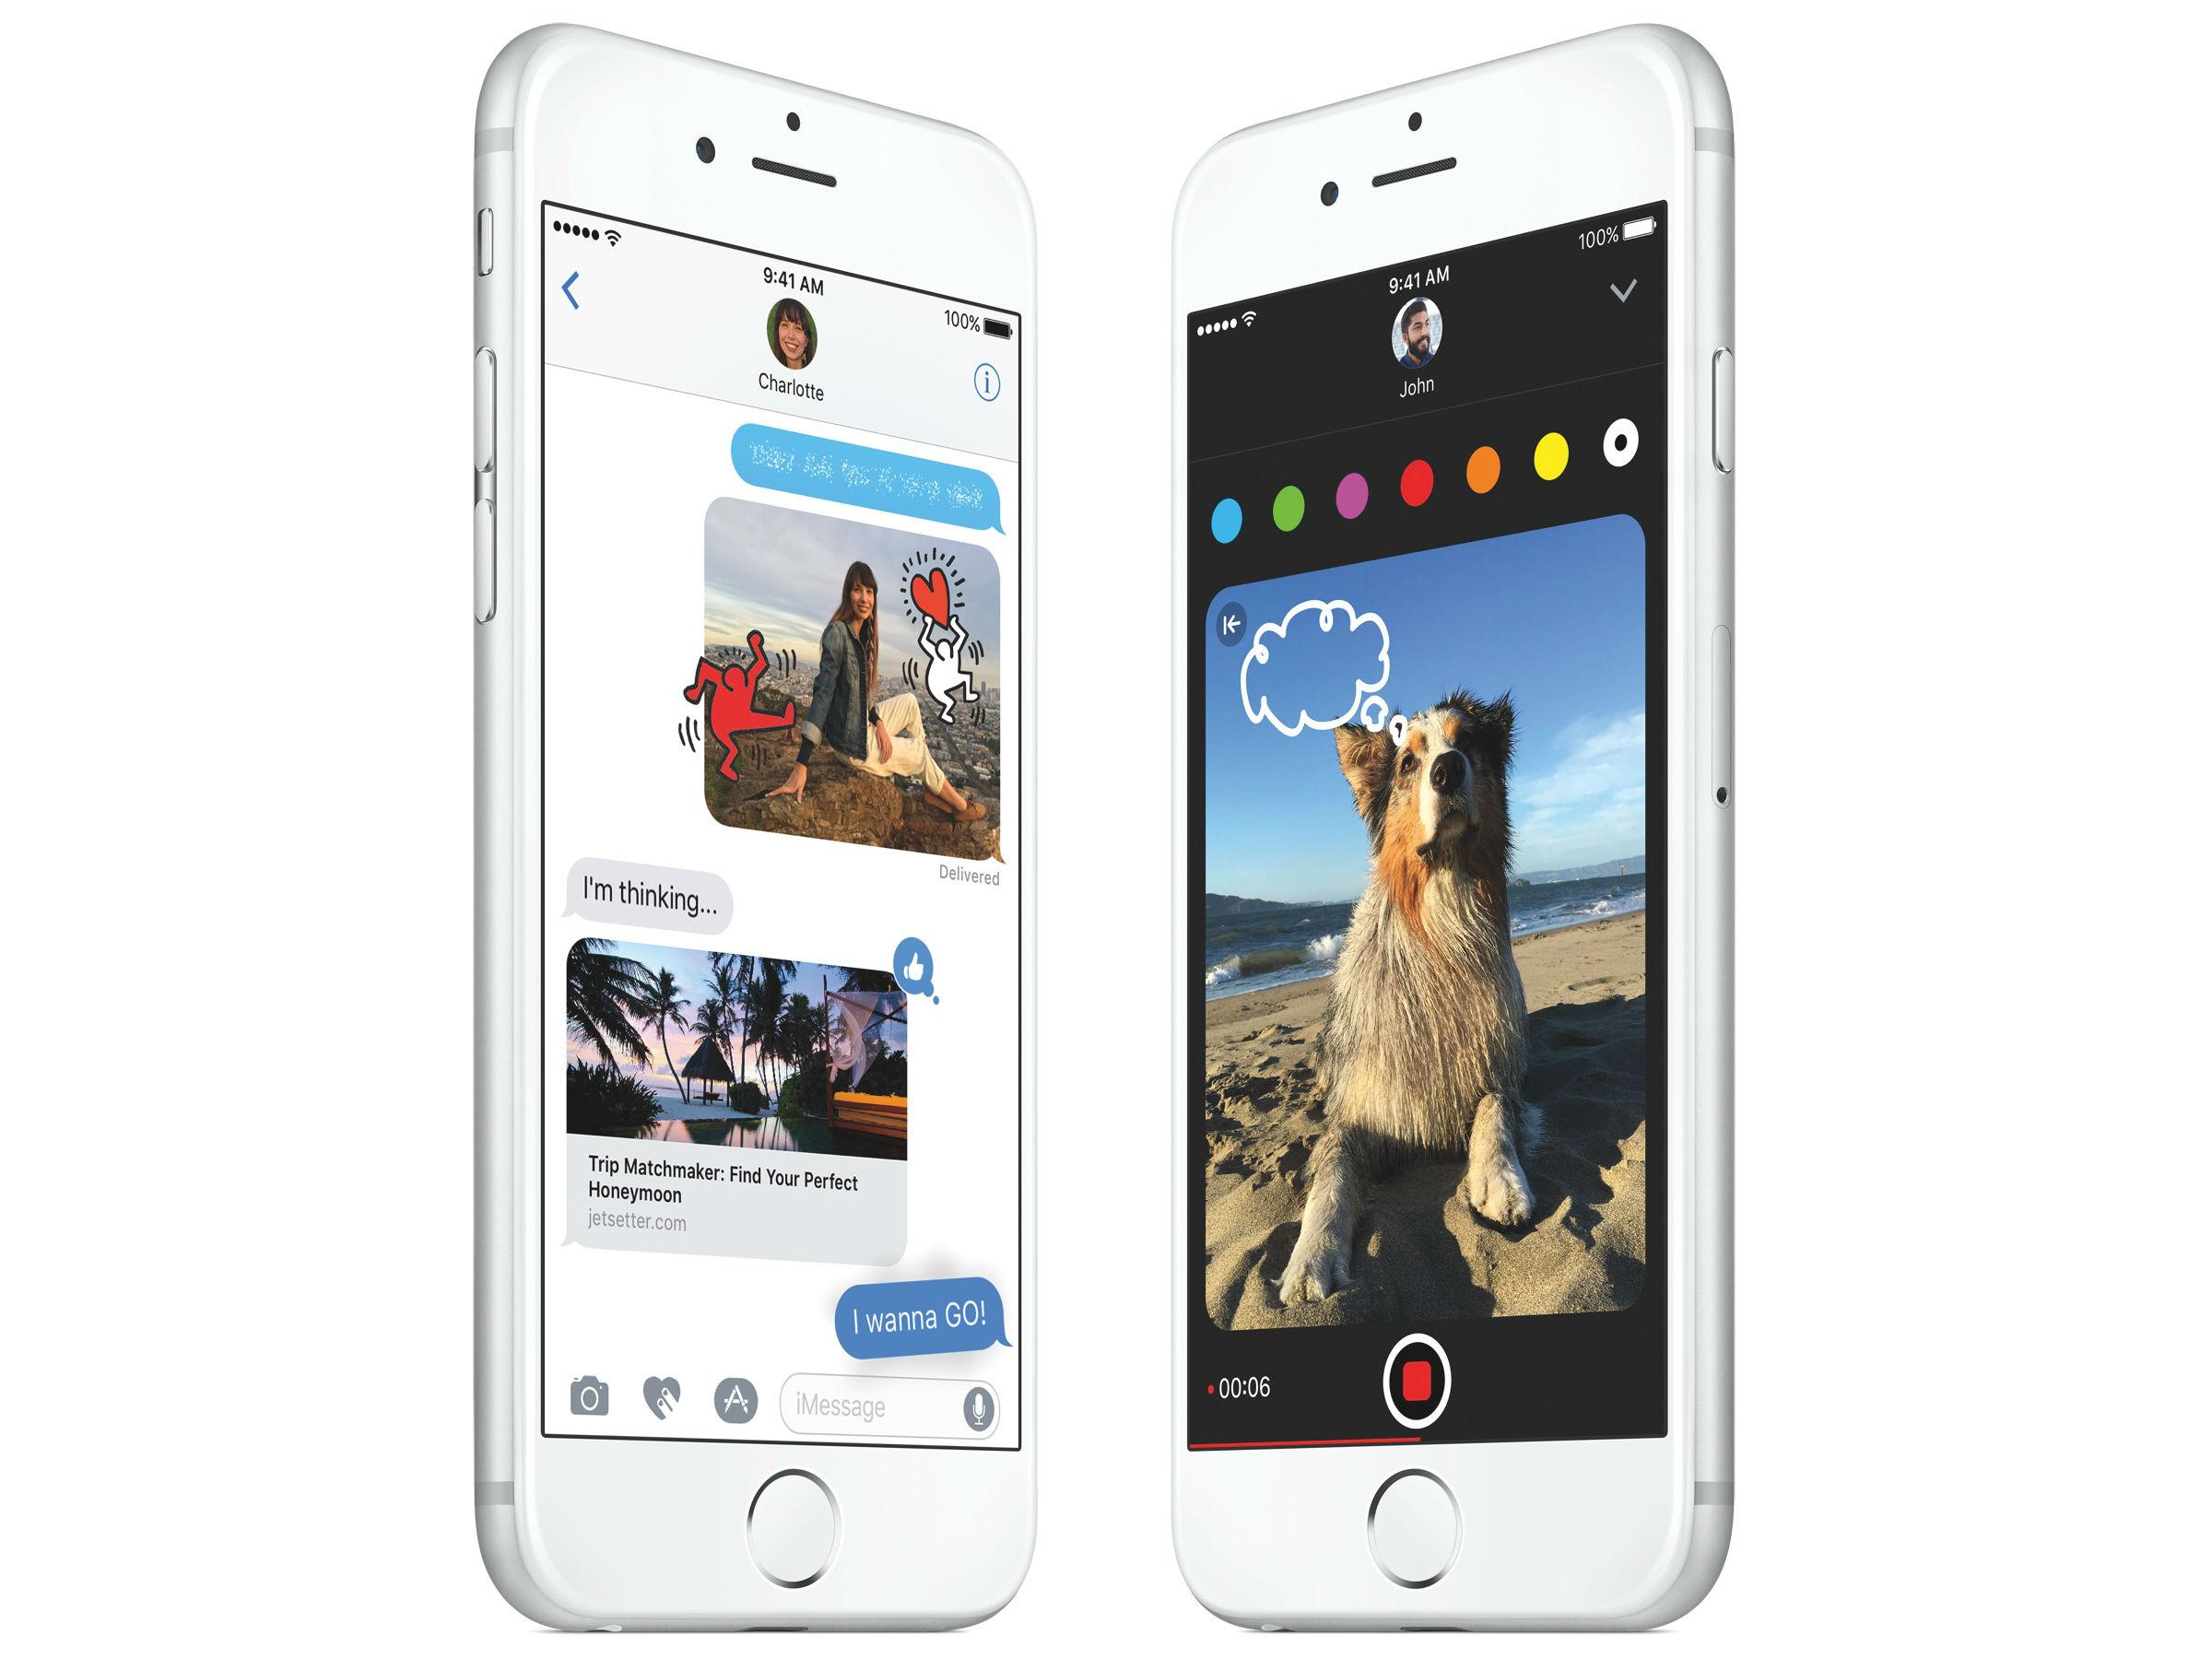 ios10 messaging digital touch.jpg